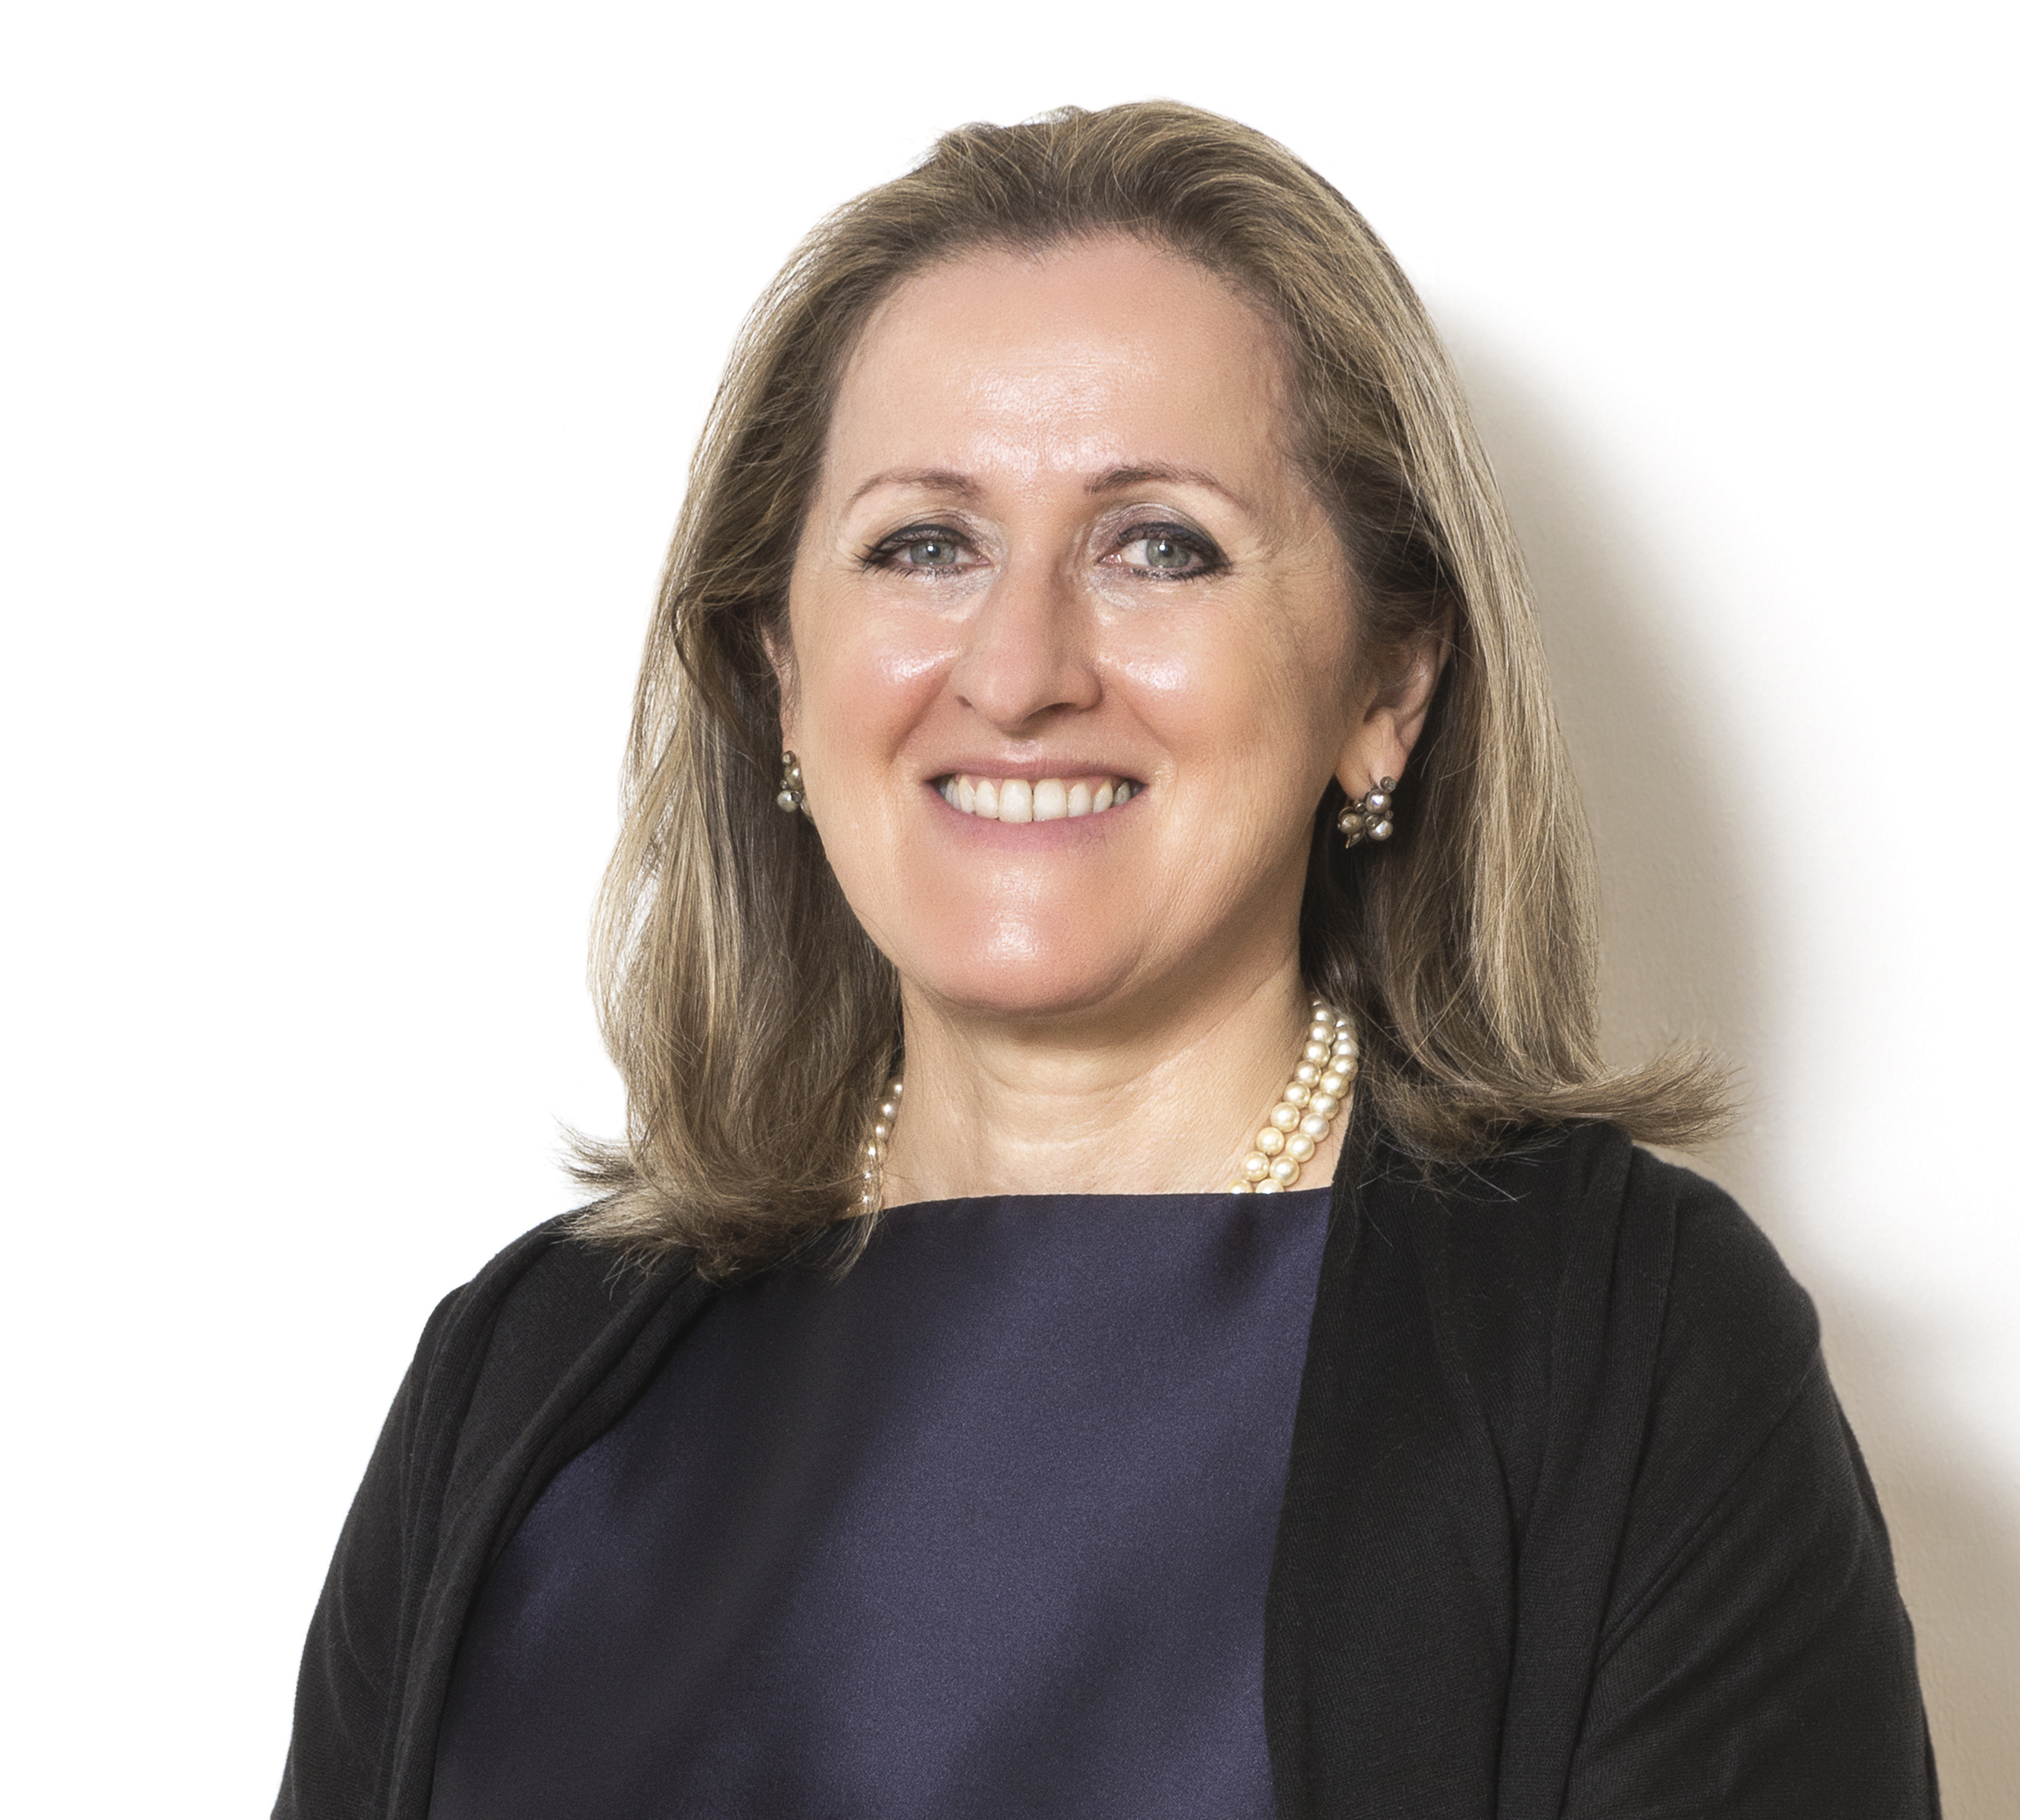 Nadia Boschi